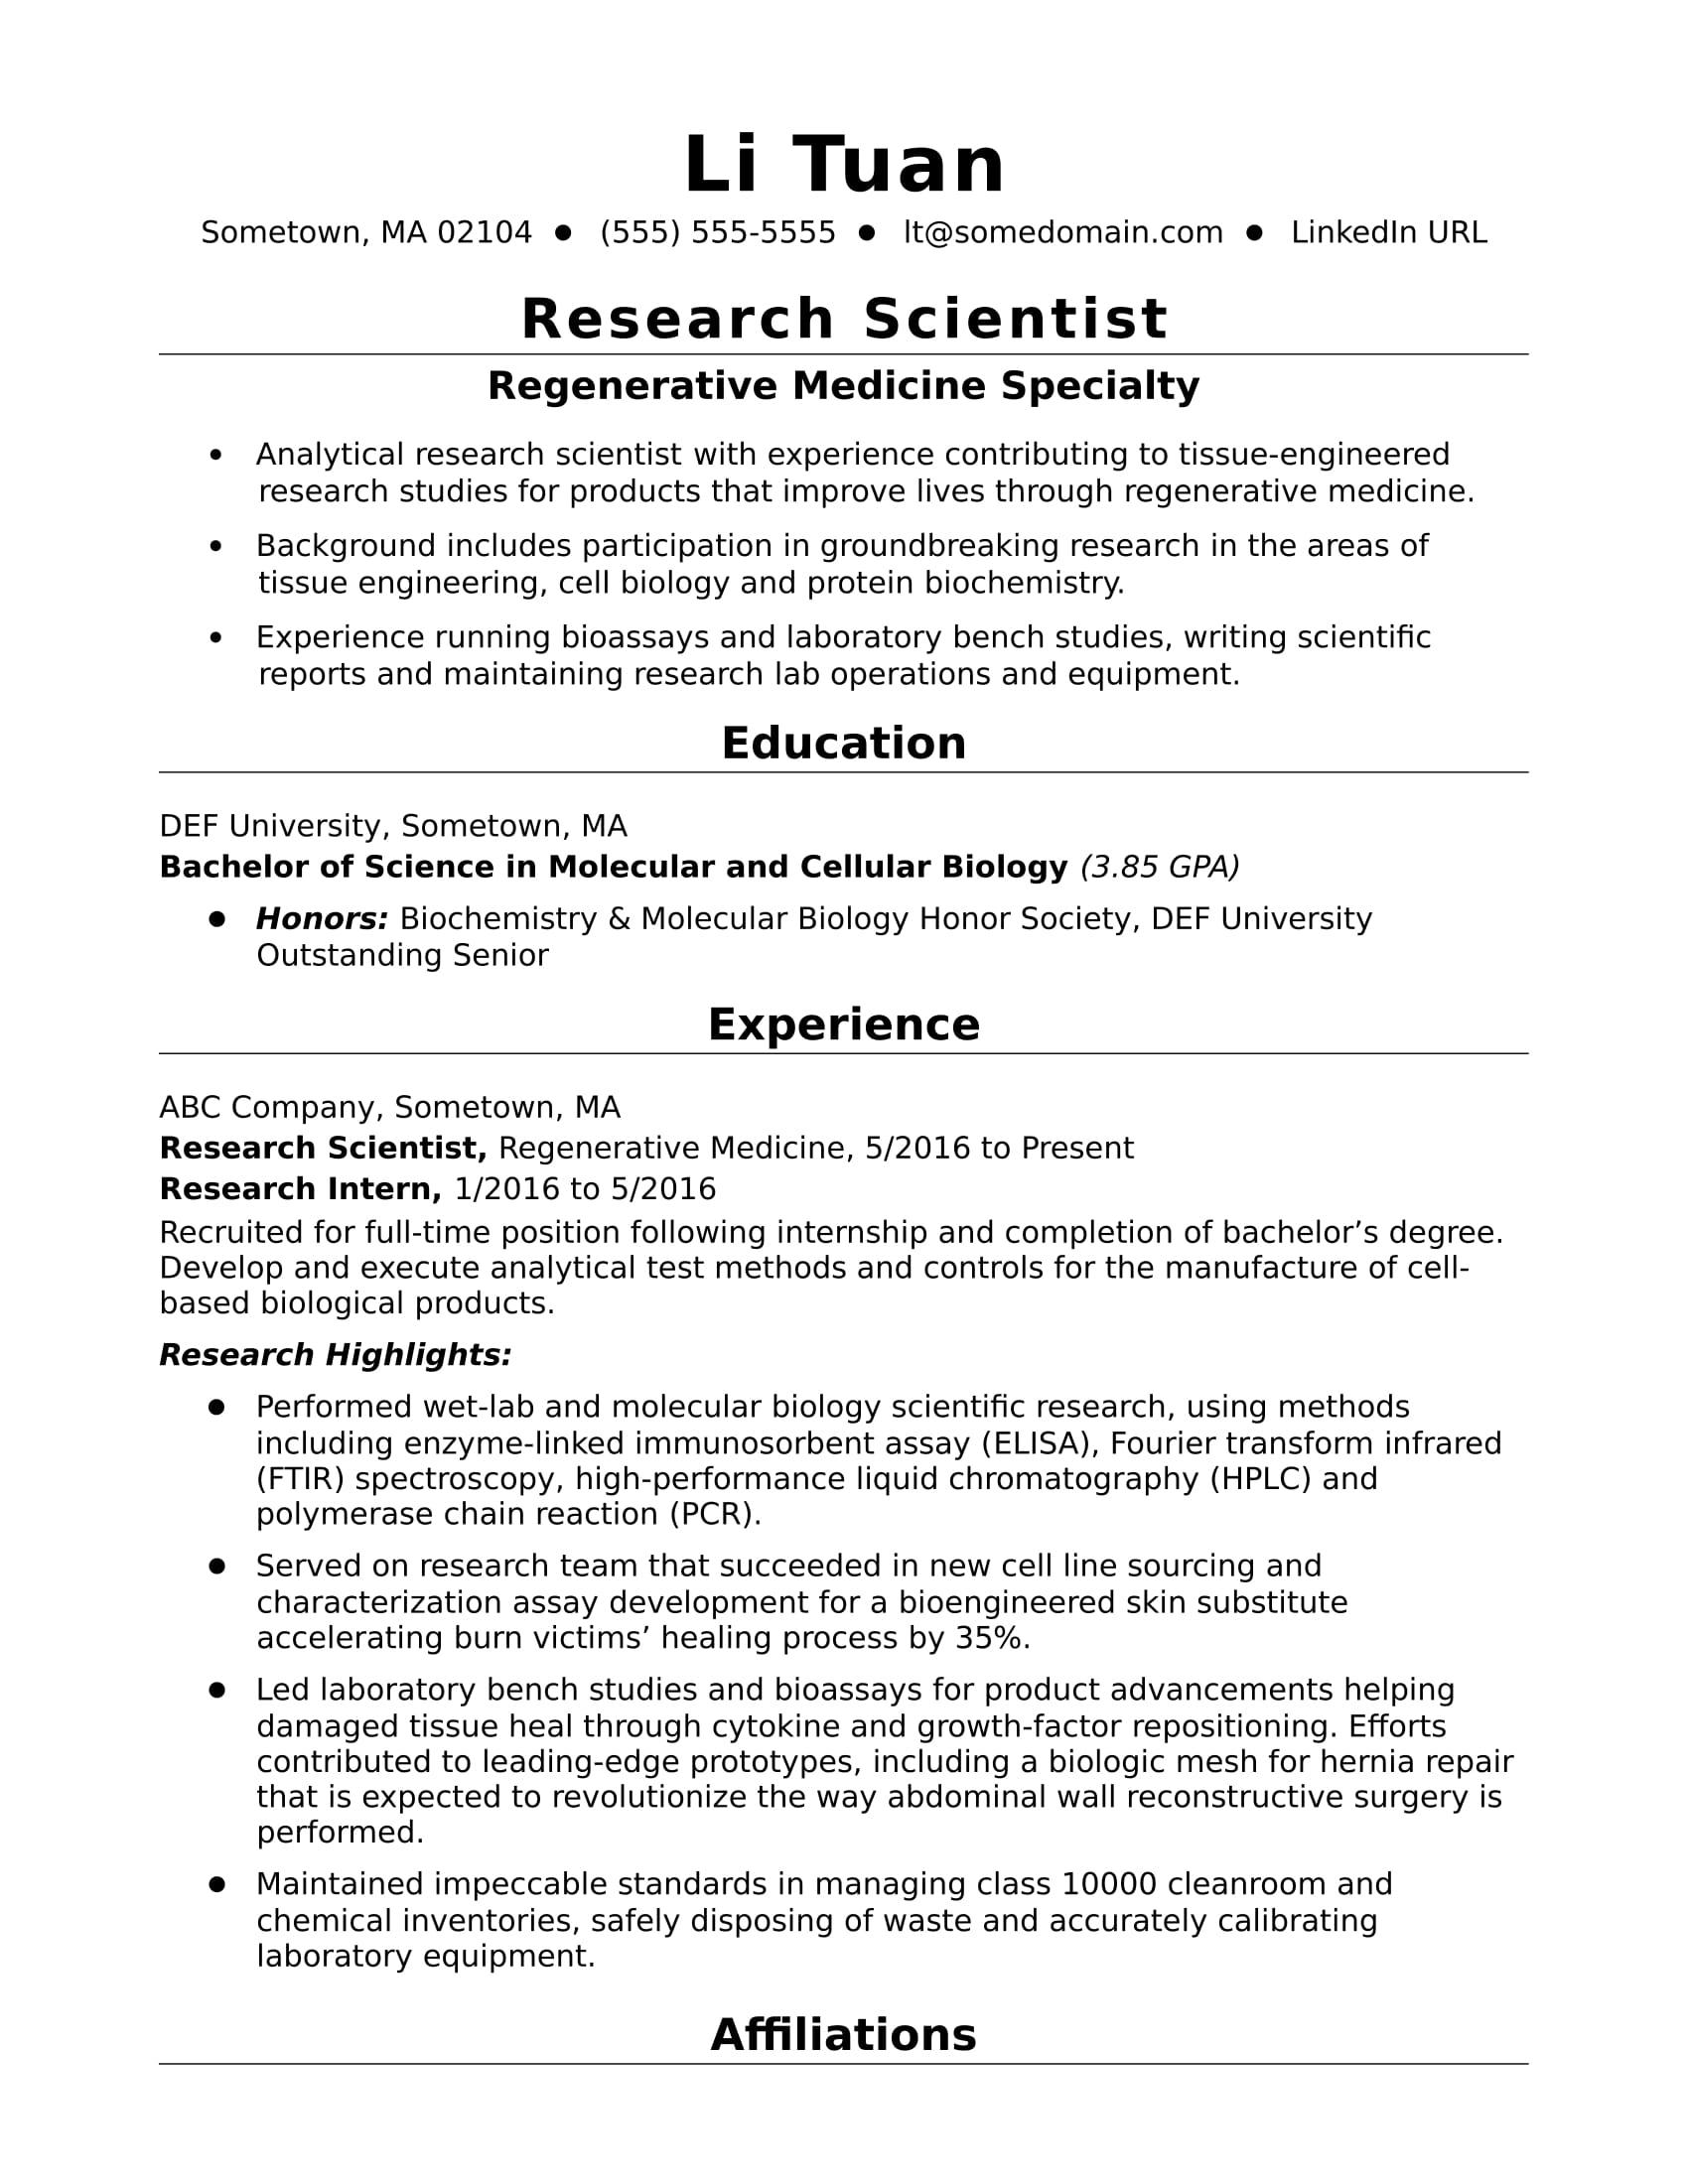 Entry Level Research Scientist Resume Sample Monster Com